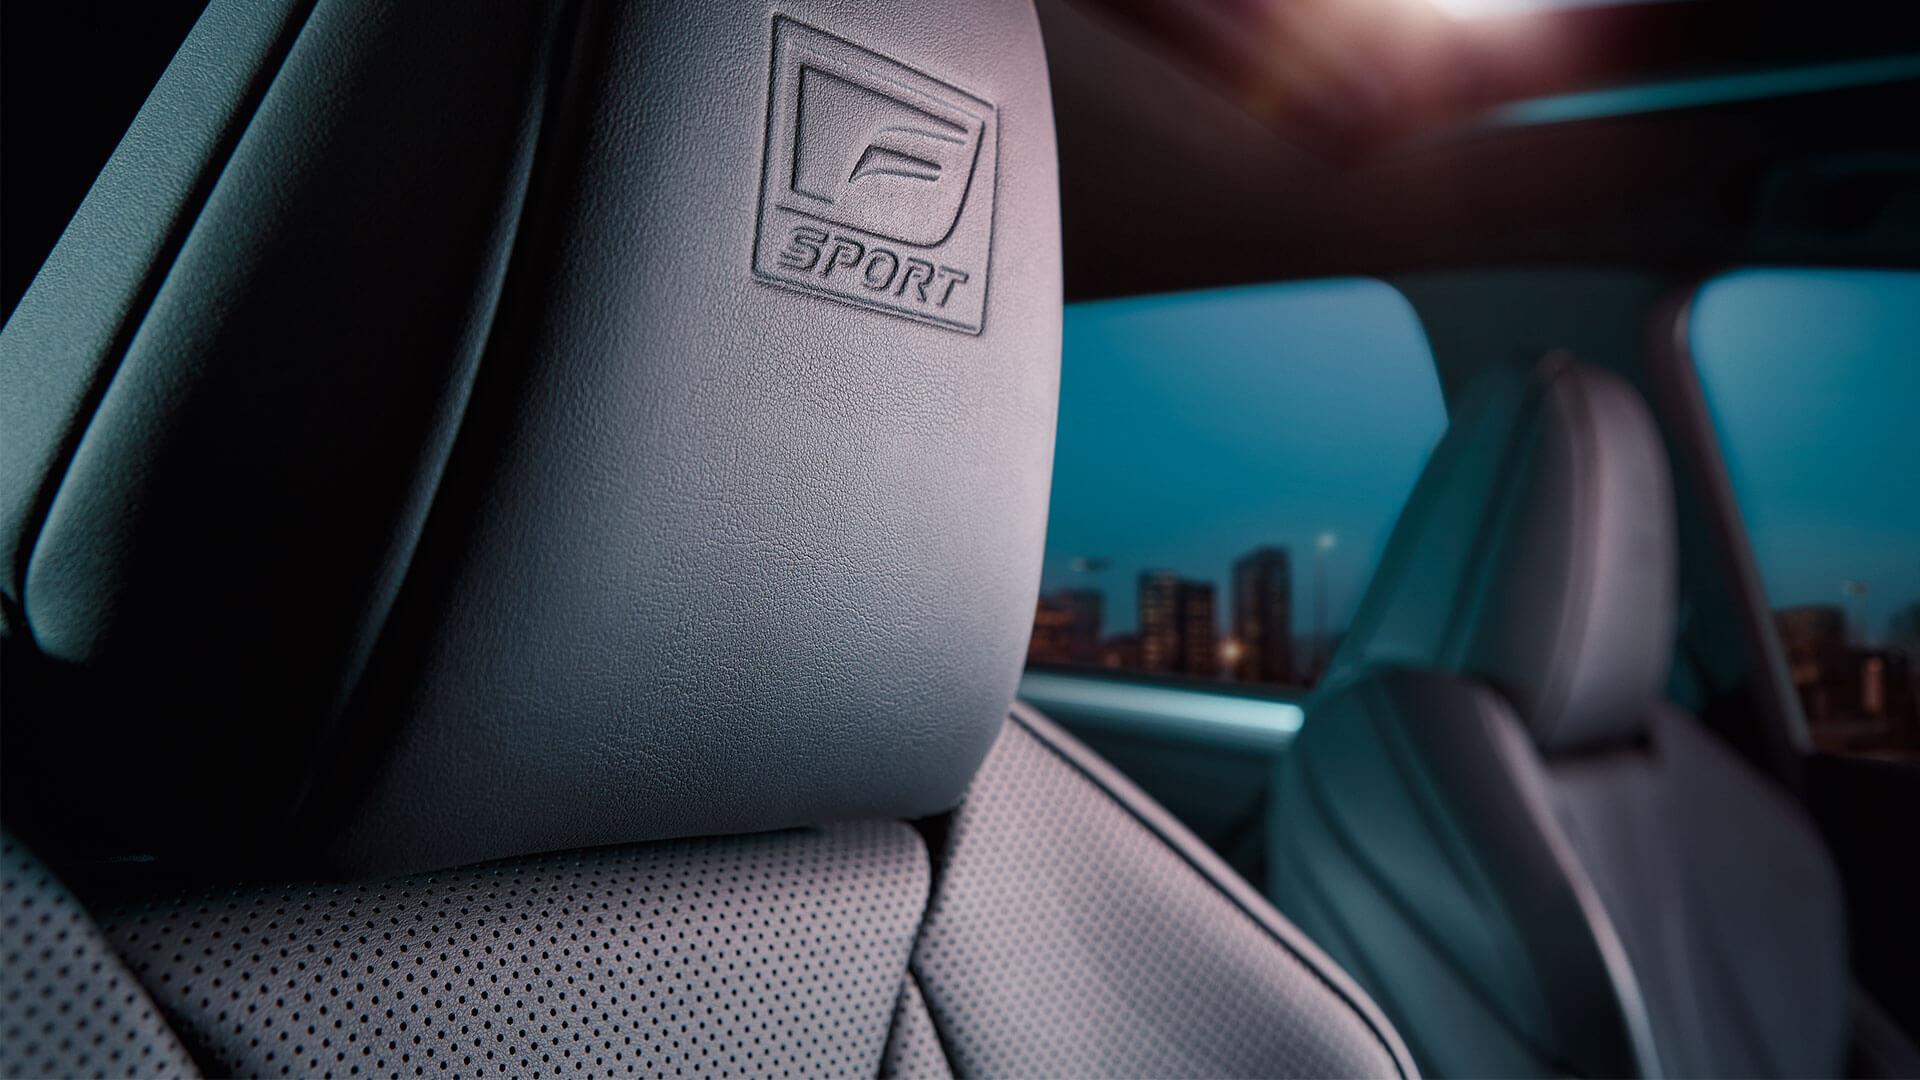 2019 lexus es hybrid experience feature leather seats